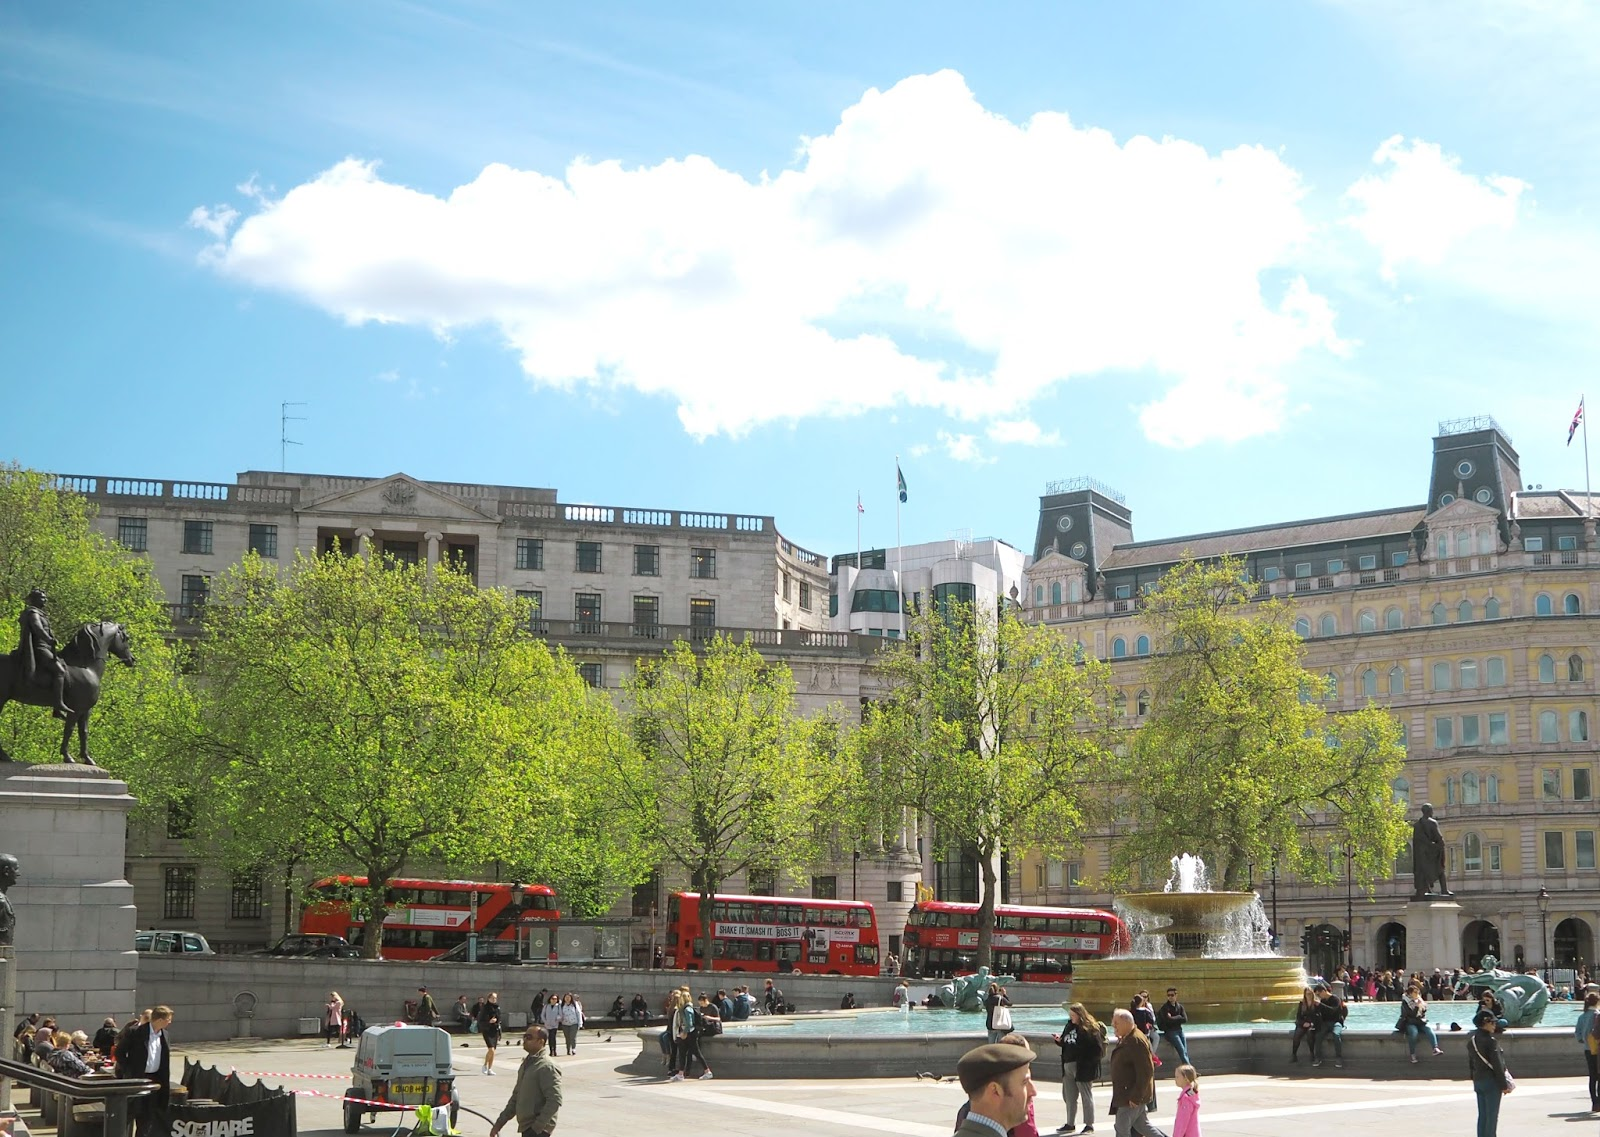 Postcards from London - Trafalgar Square